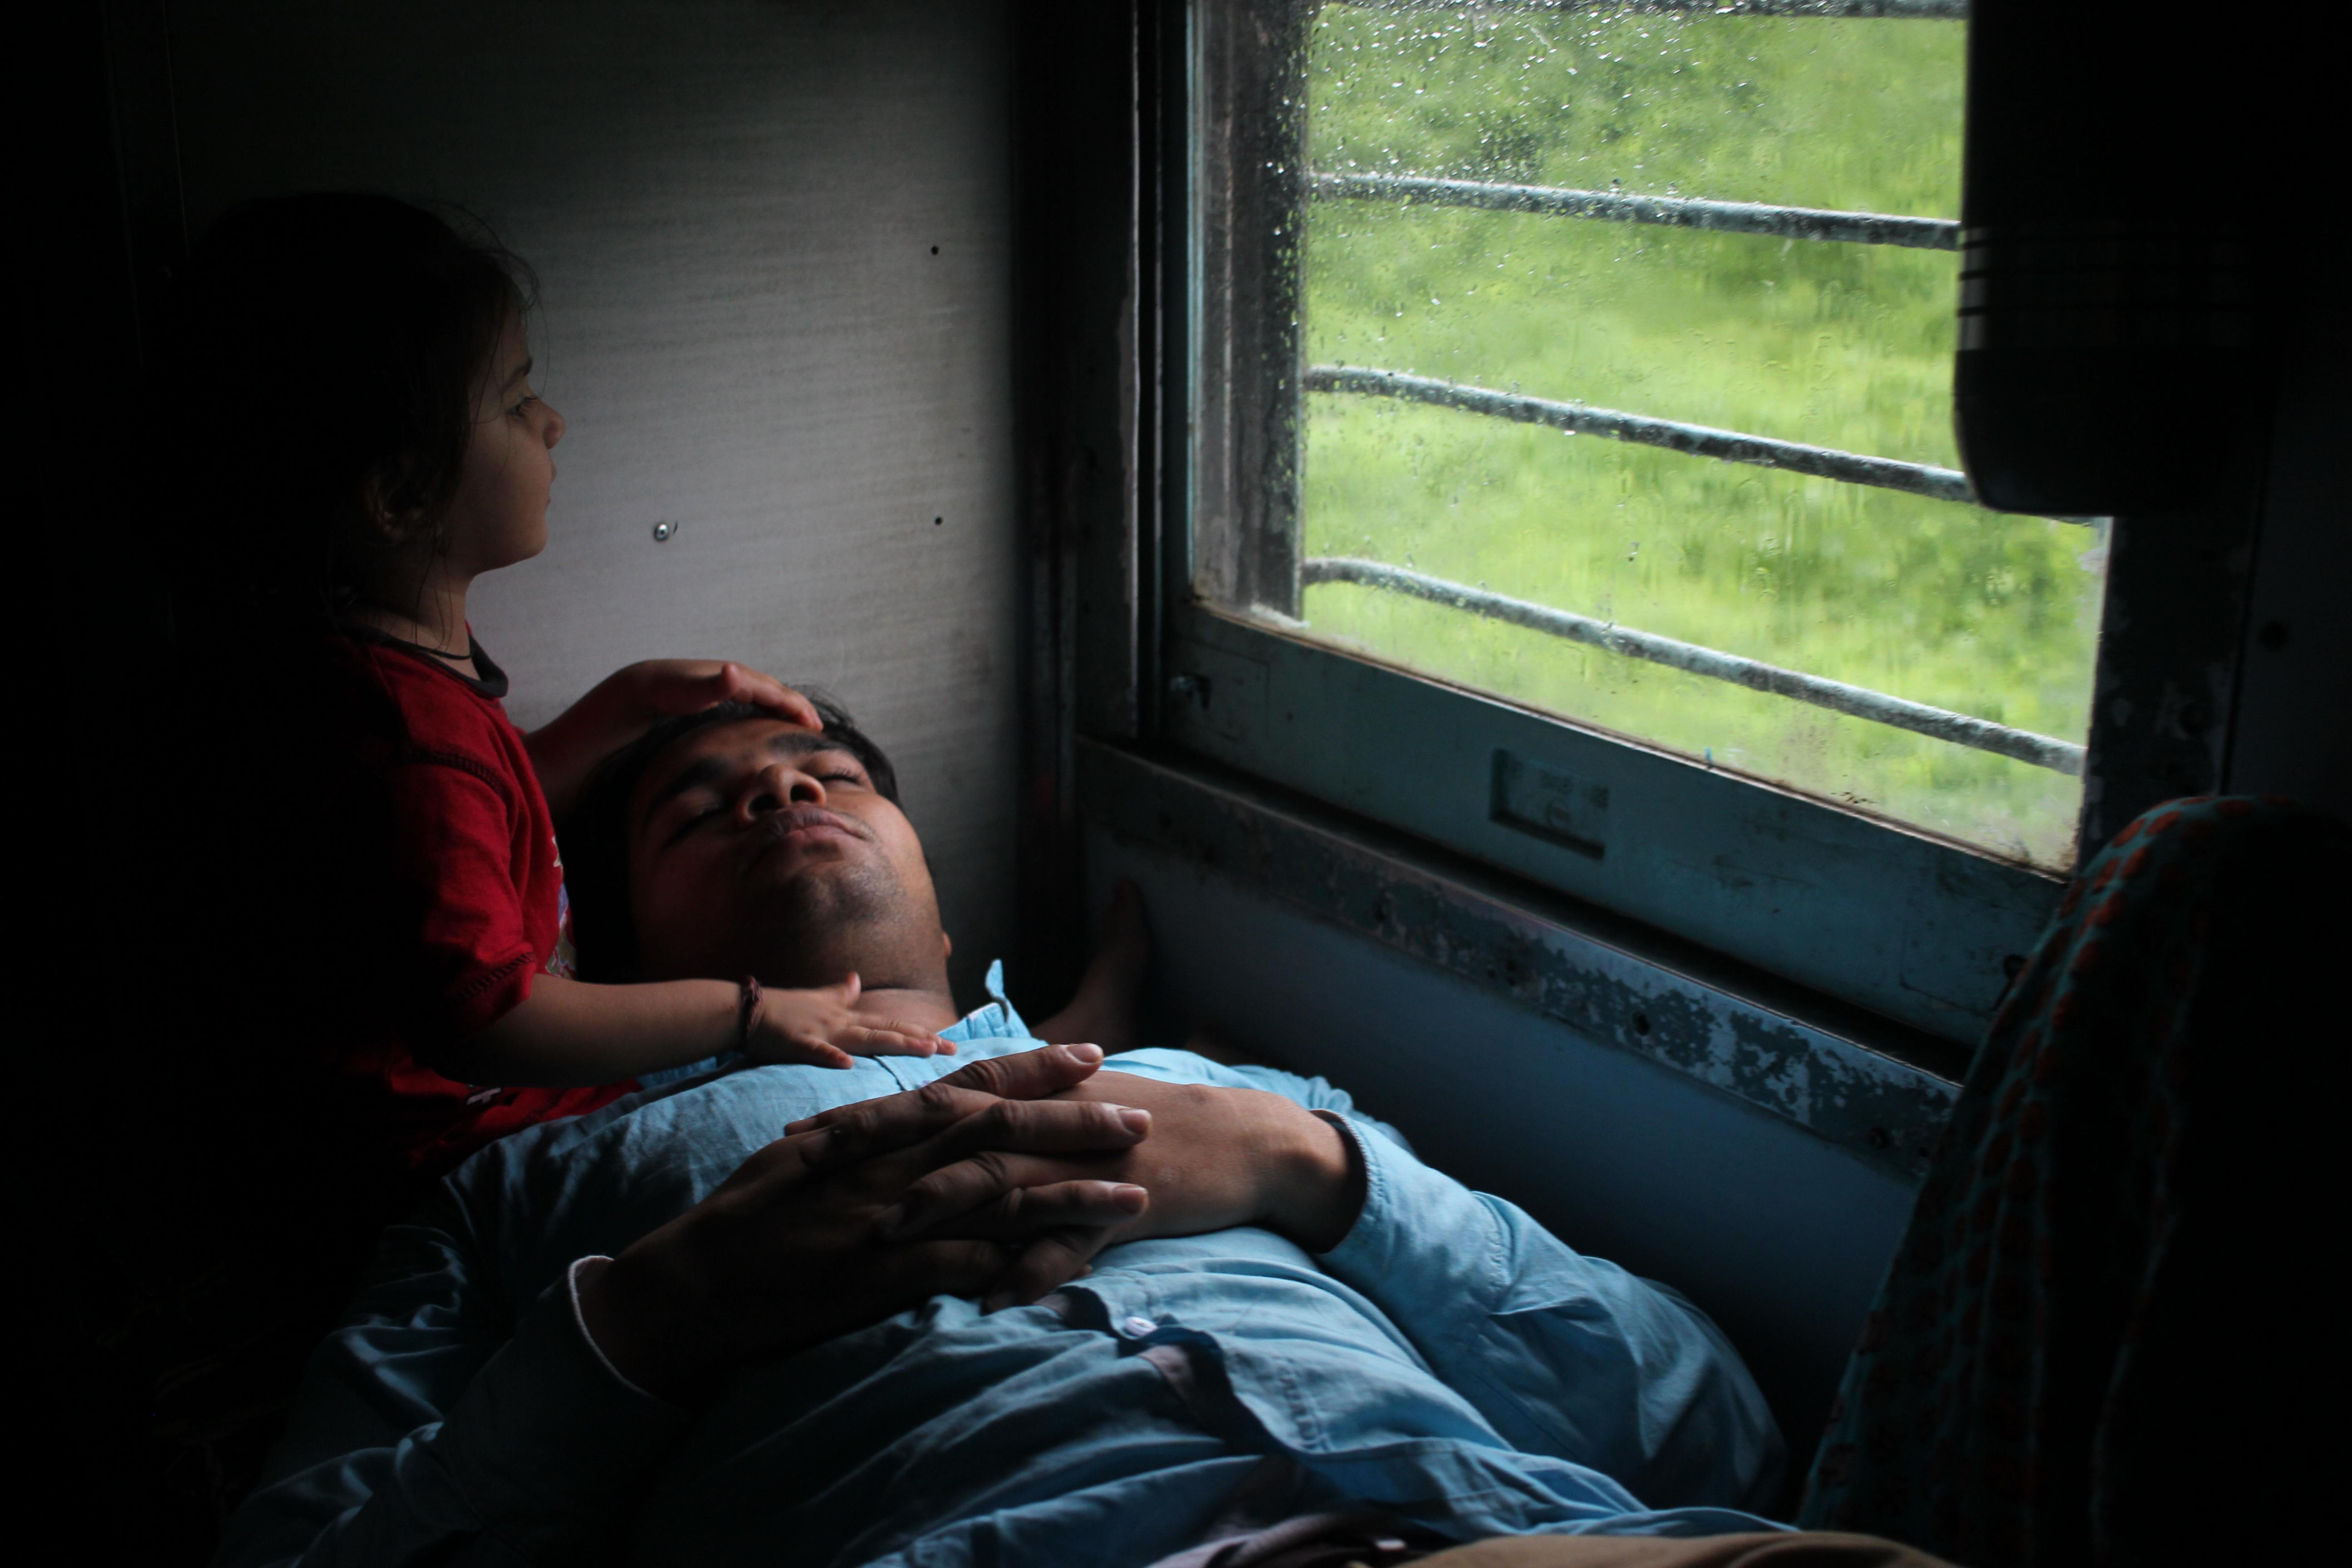 Railways, 2, India, 2015